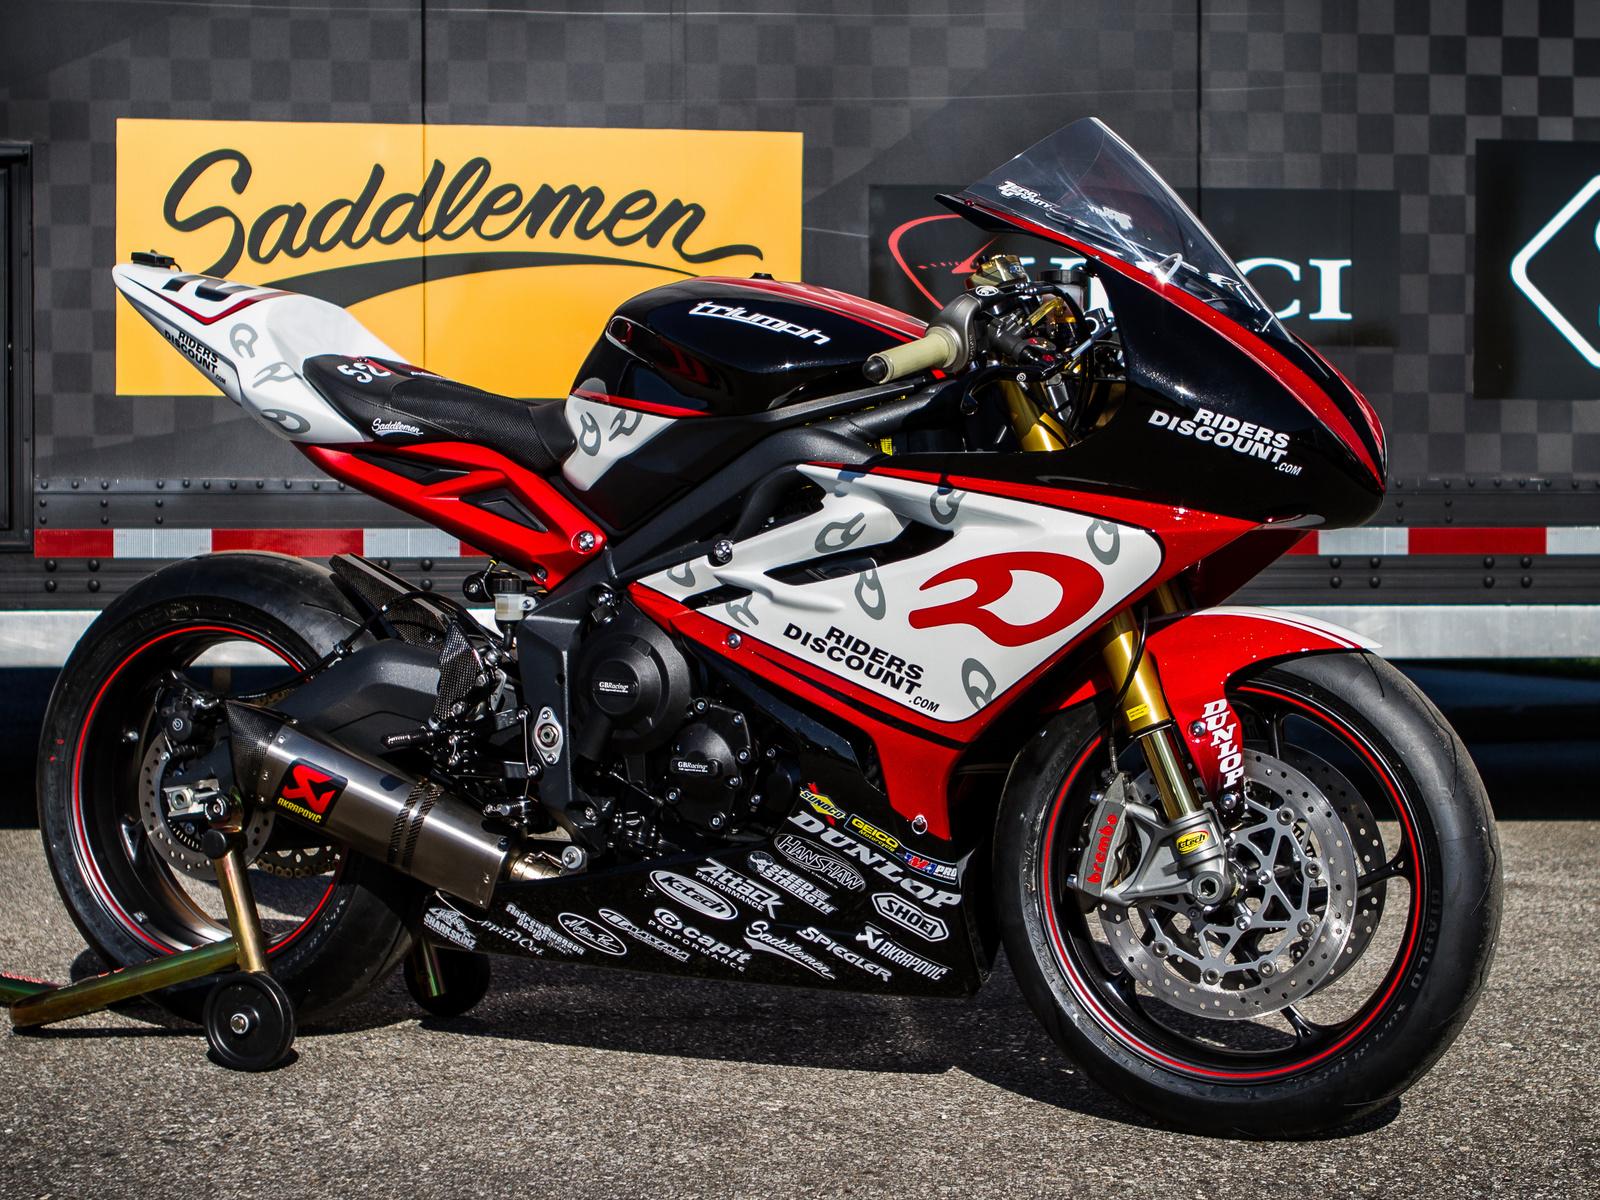 jake zemke, joins riders, discount, triumph, team, мотоцикл, байк